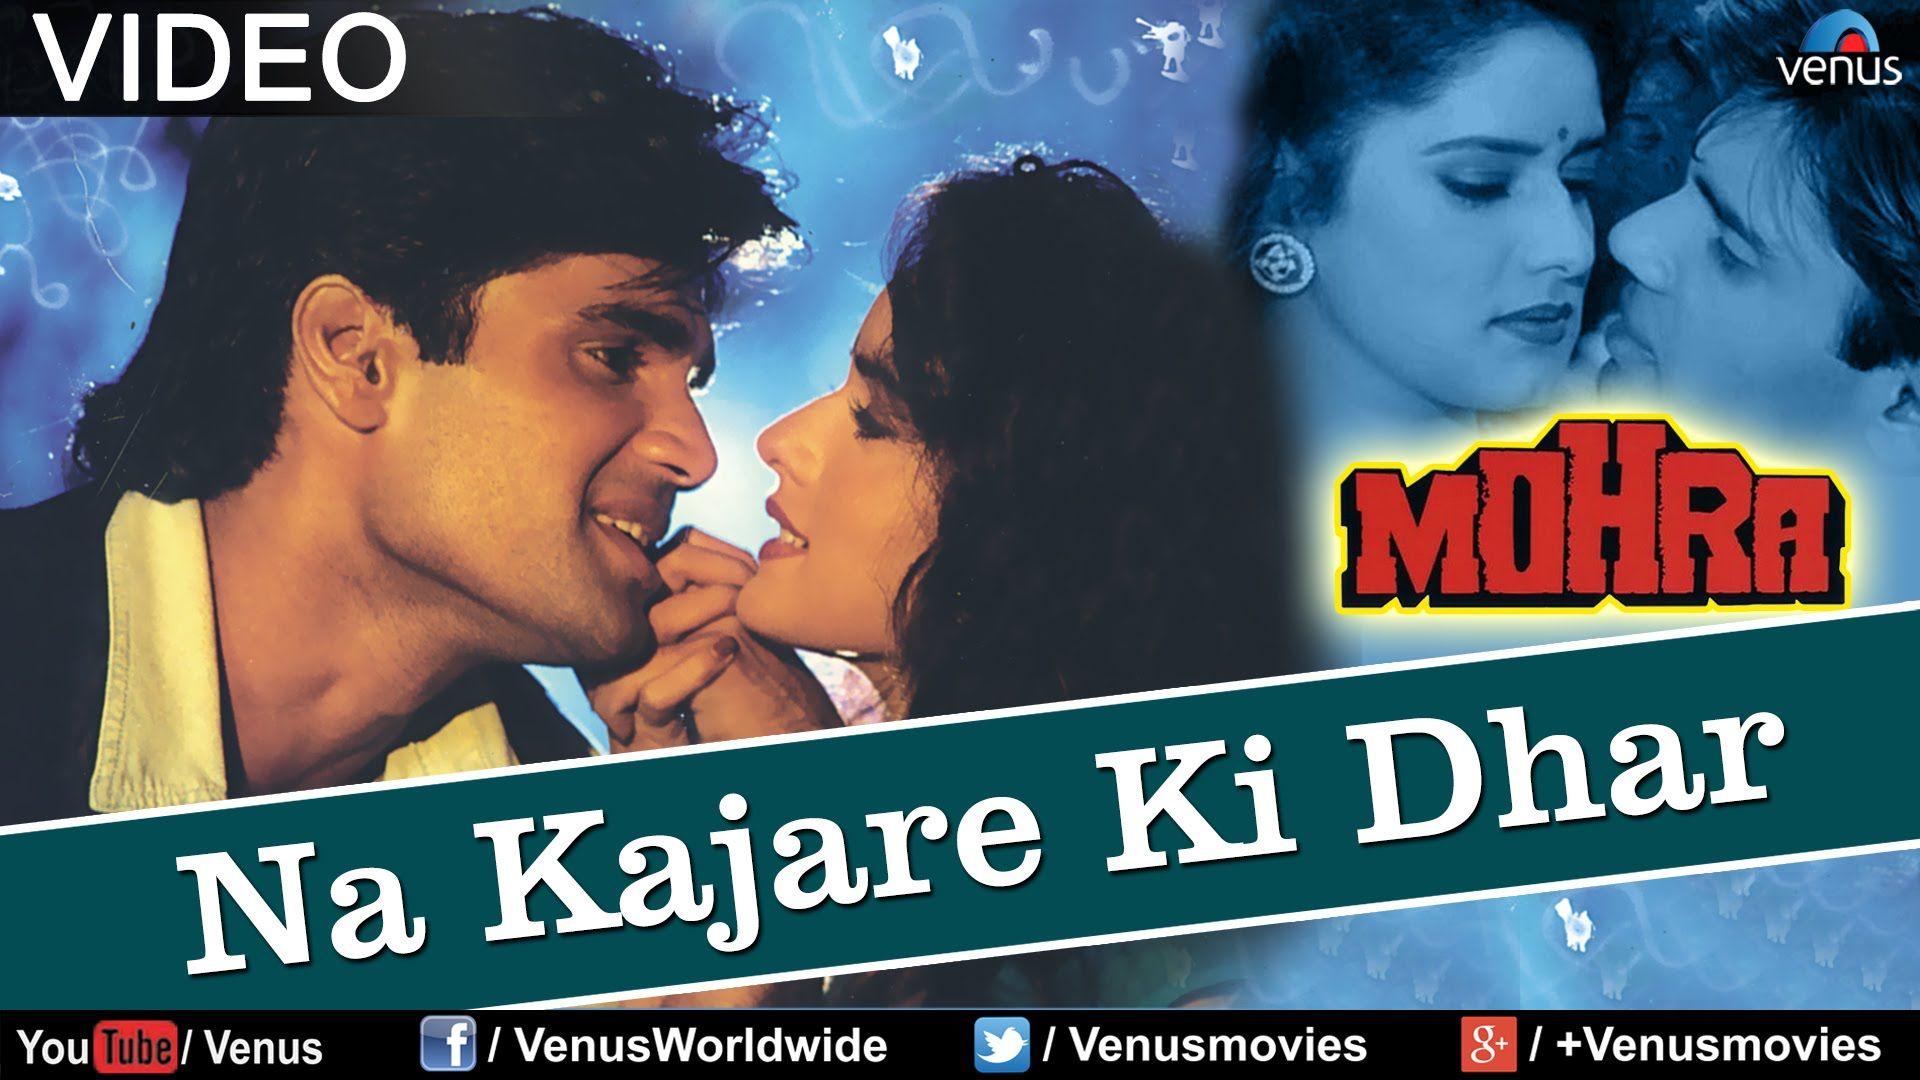 Na Kajare Ki Dhar Mohra Hindi Movie Song Latest Bollywood Songs Youtube